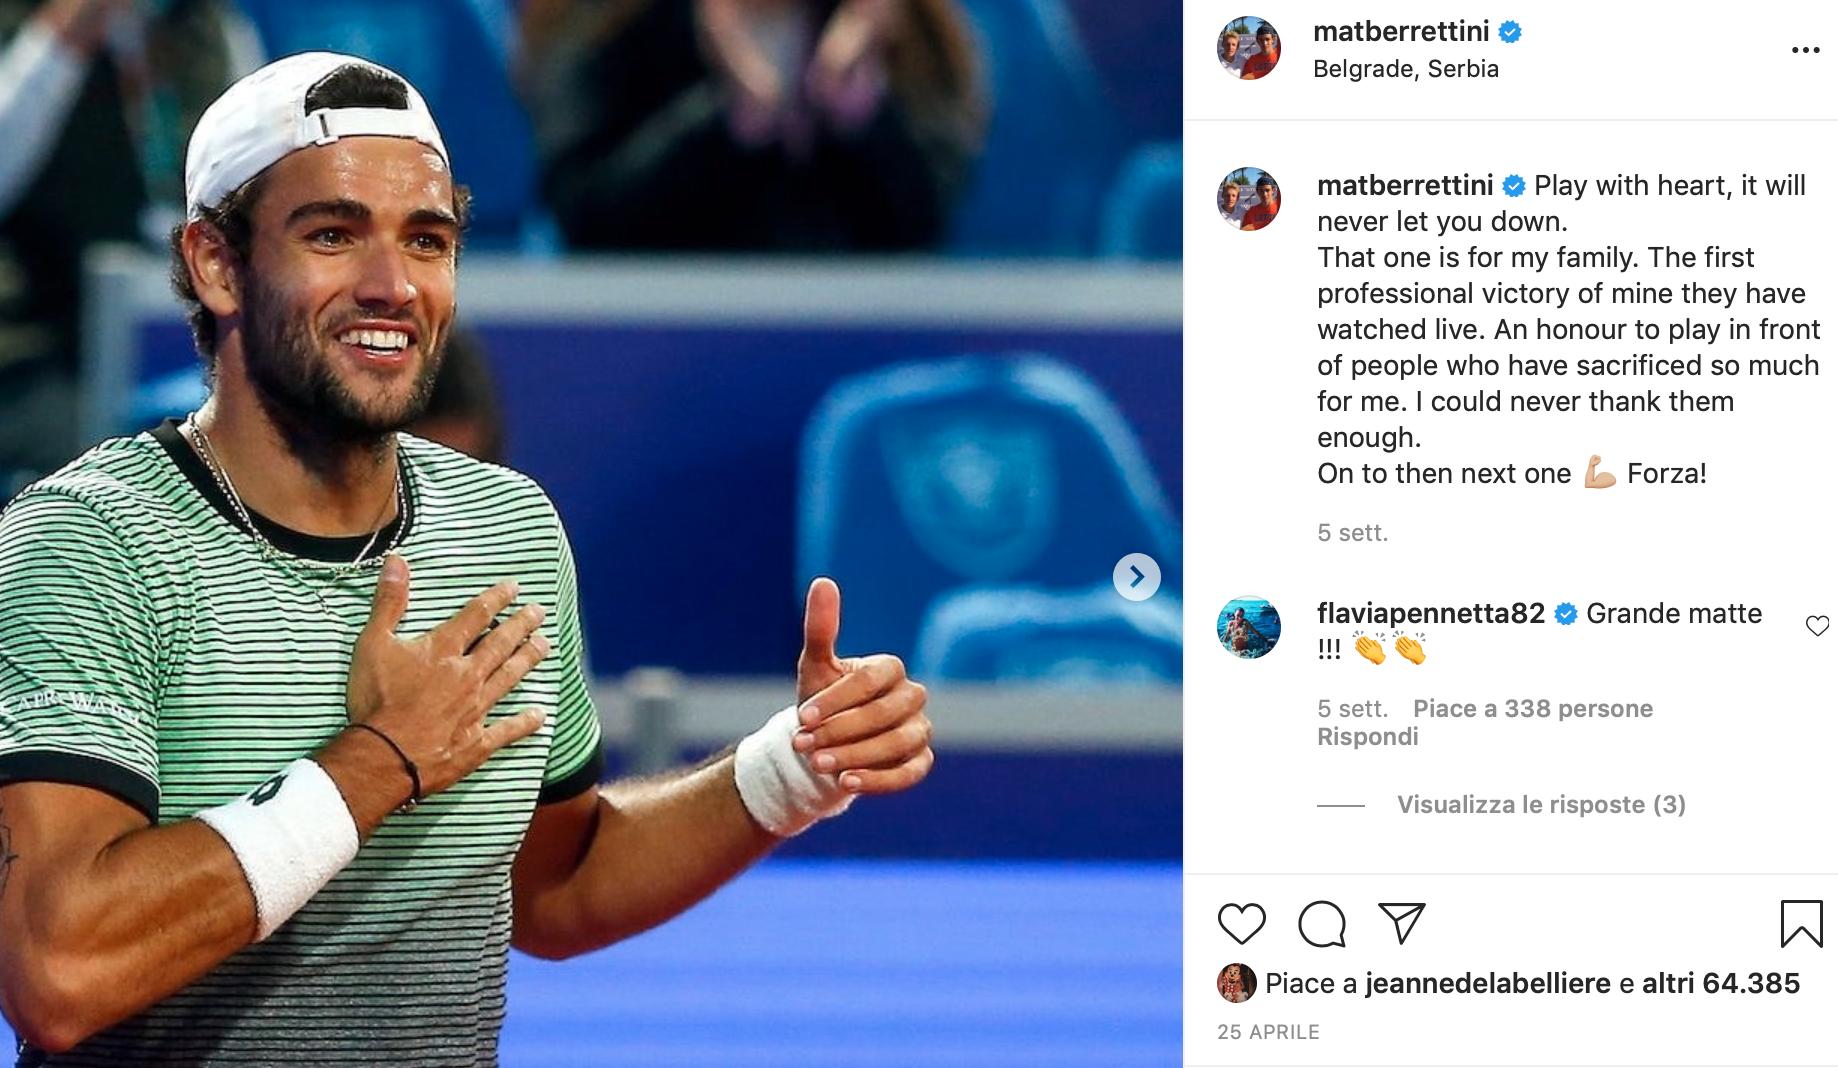 Matteo Berrettini Instagram